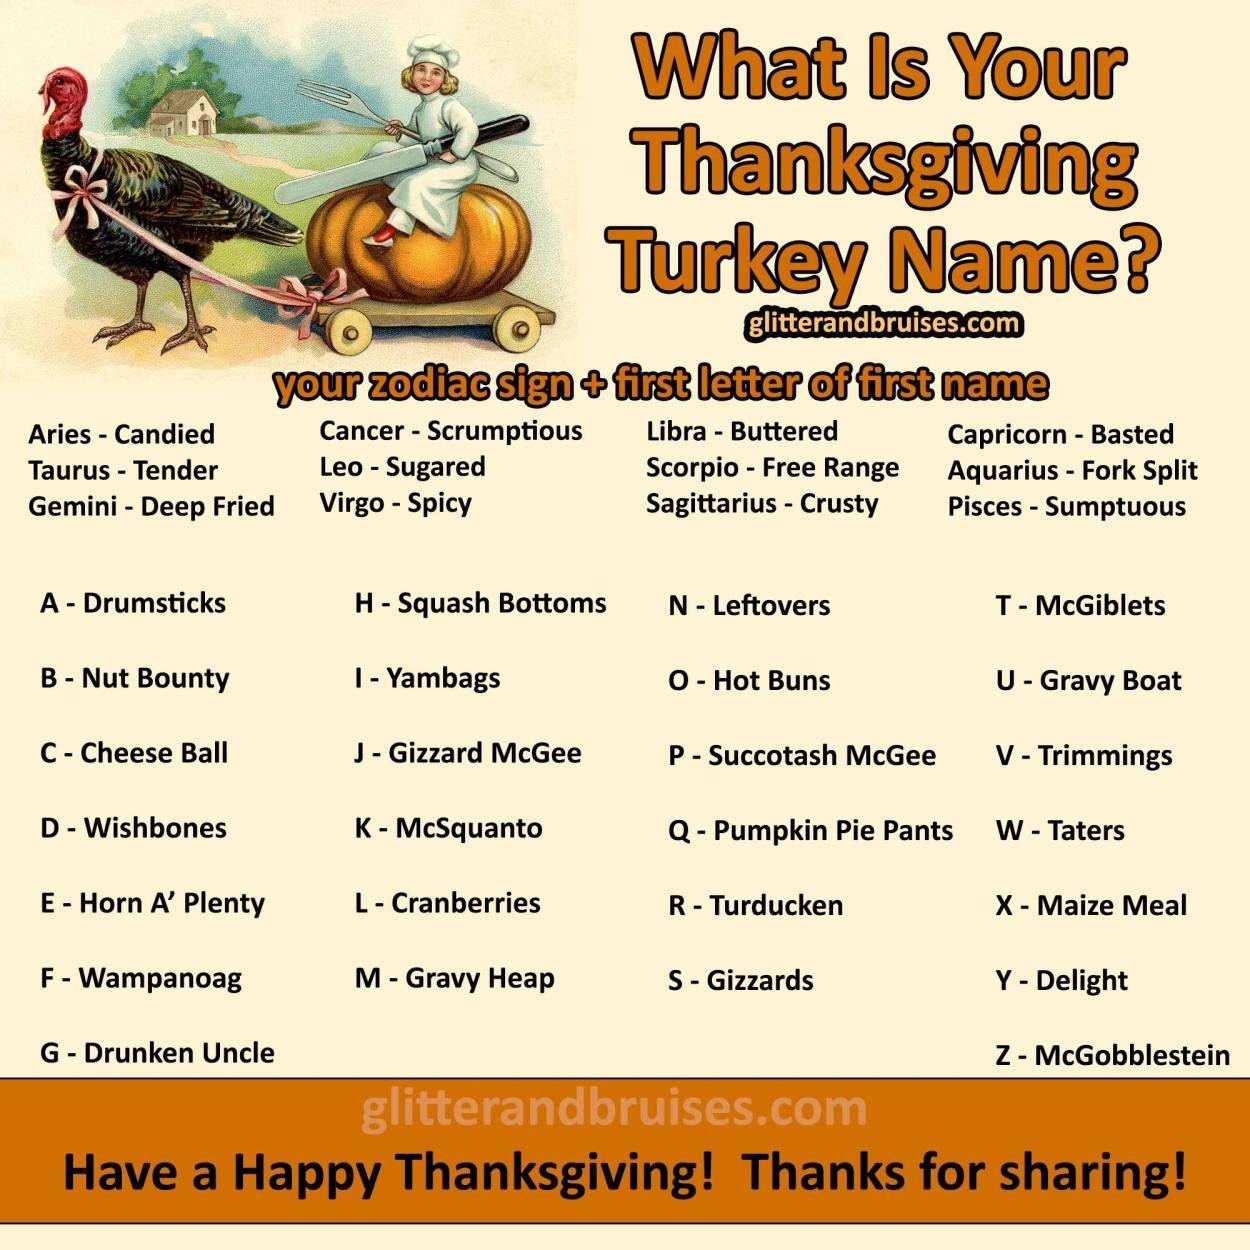 A Few of My Favorite Things - November